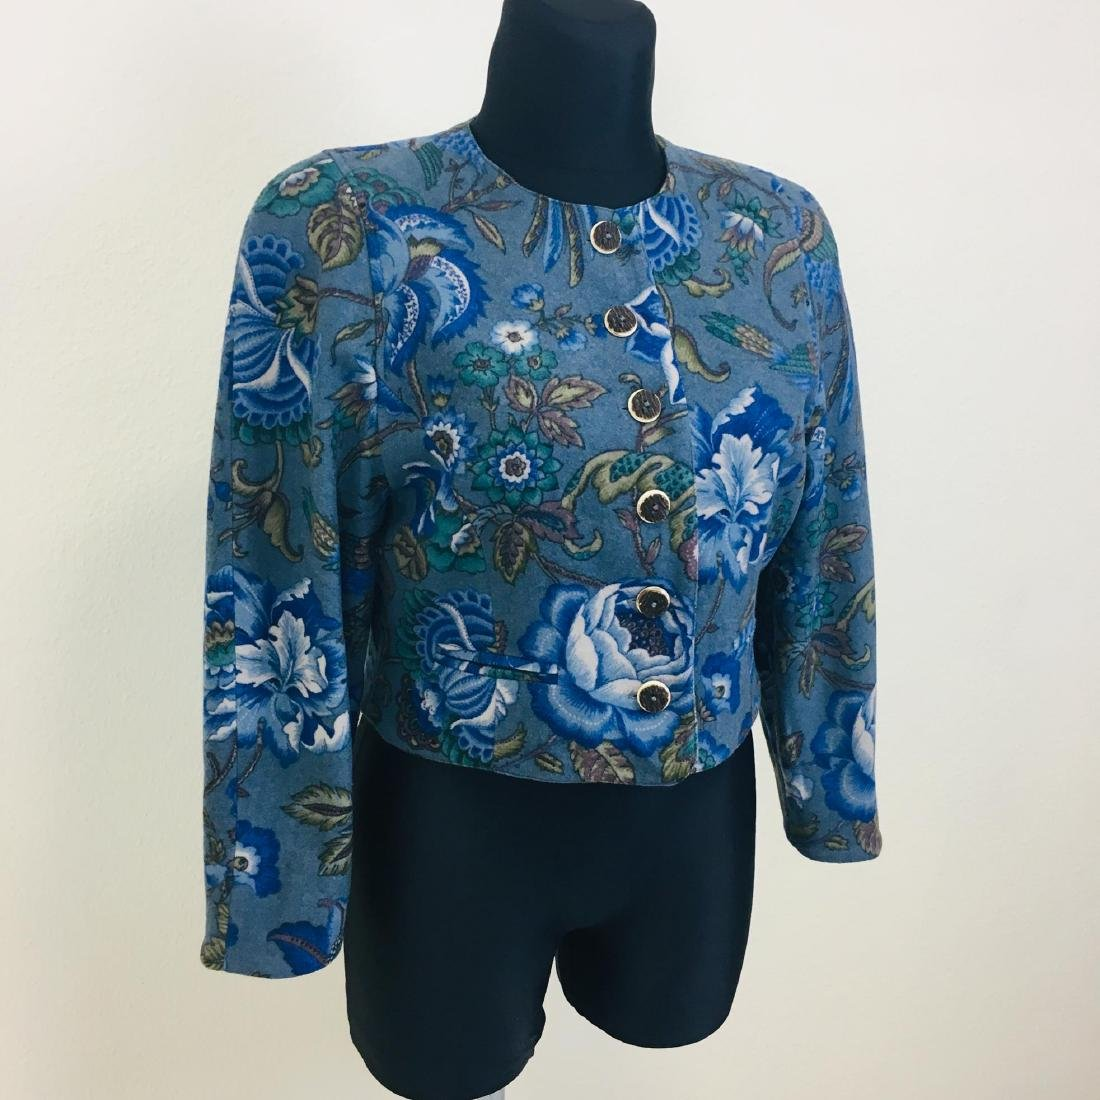 Vintage Women's Wool Blend Blazer Jacket - 2